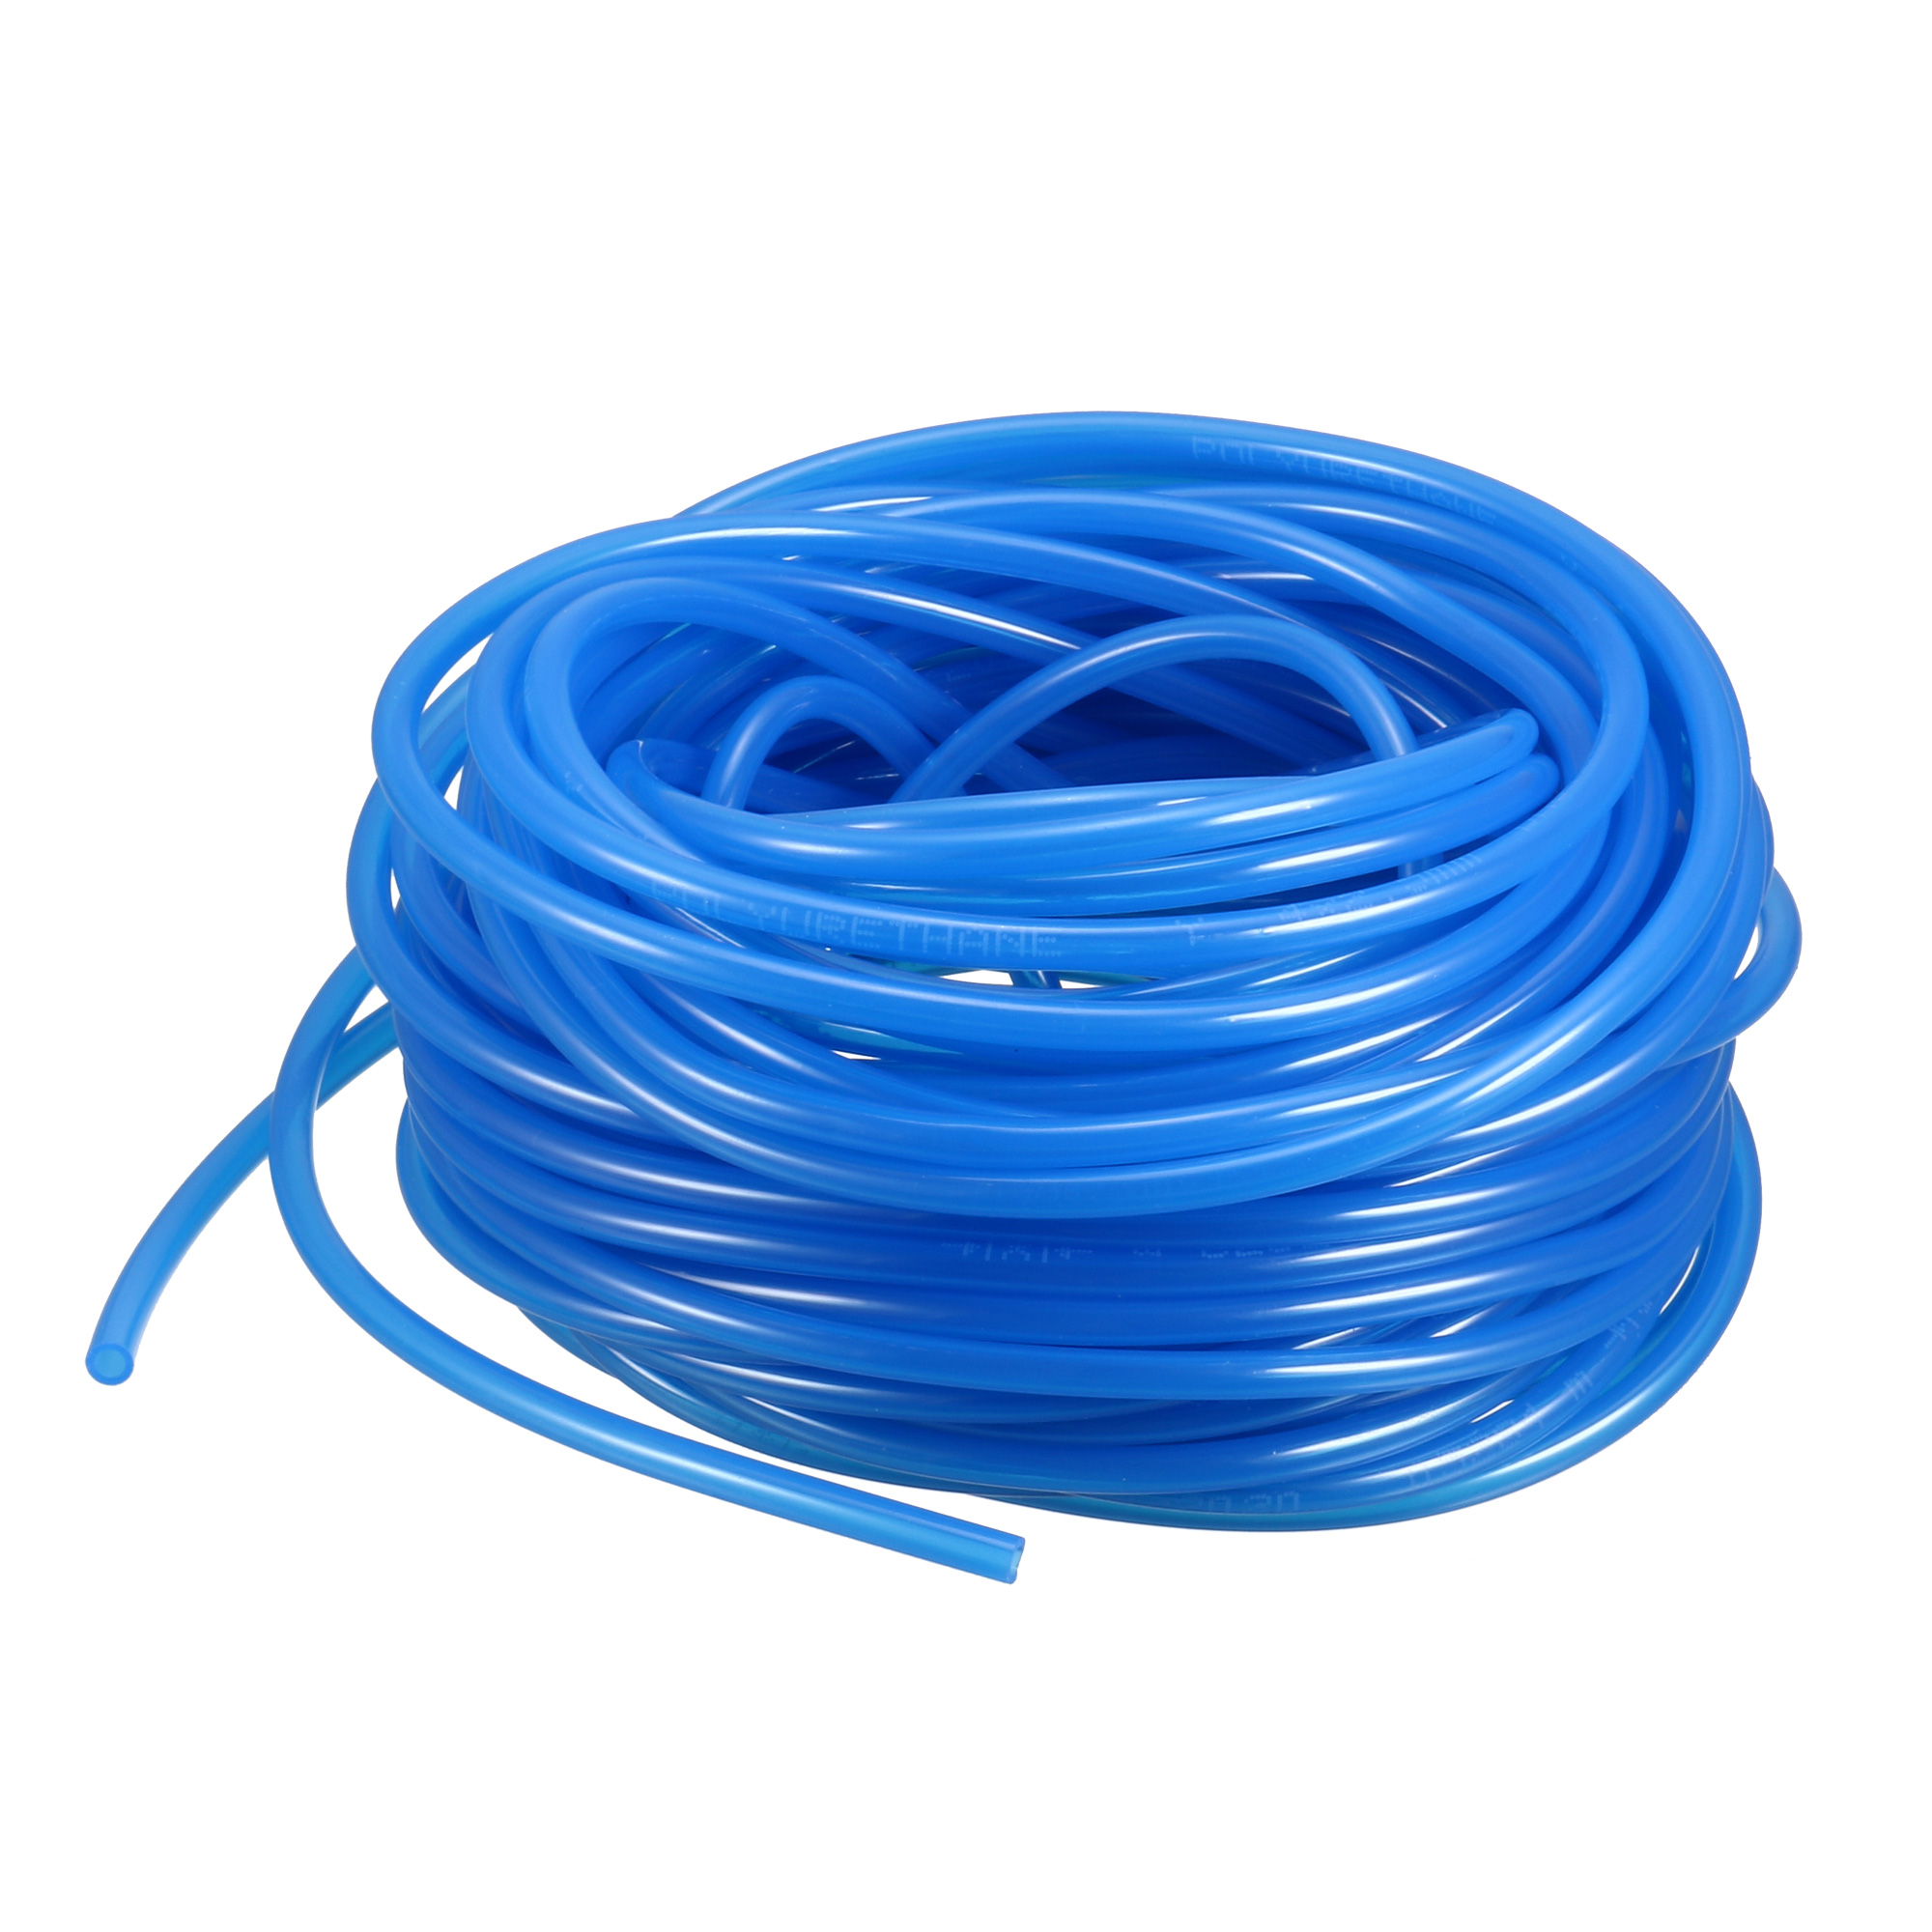 15M 49.2Ft 4mm x 2.5mm PU Polyurethane Air Tubing Tube Pipe Blue